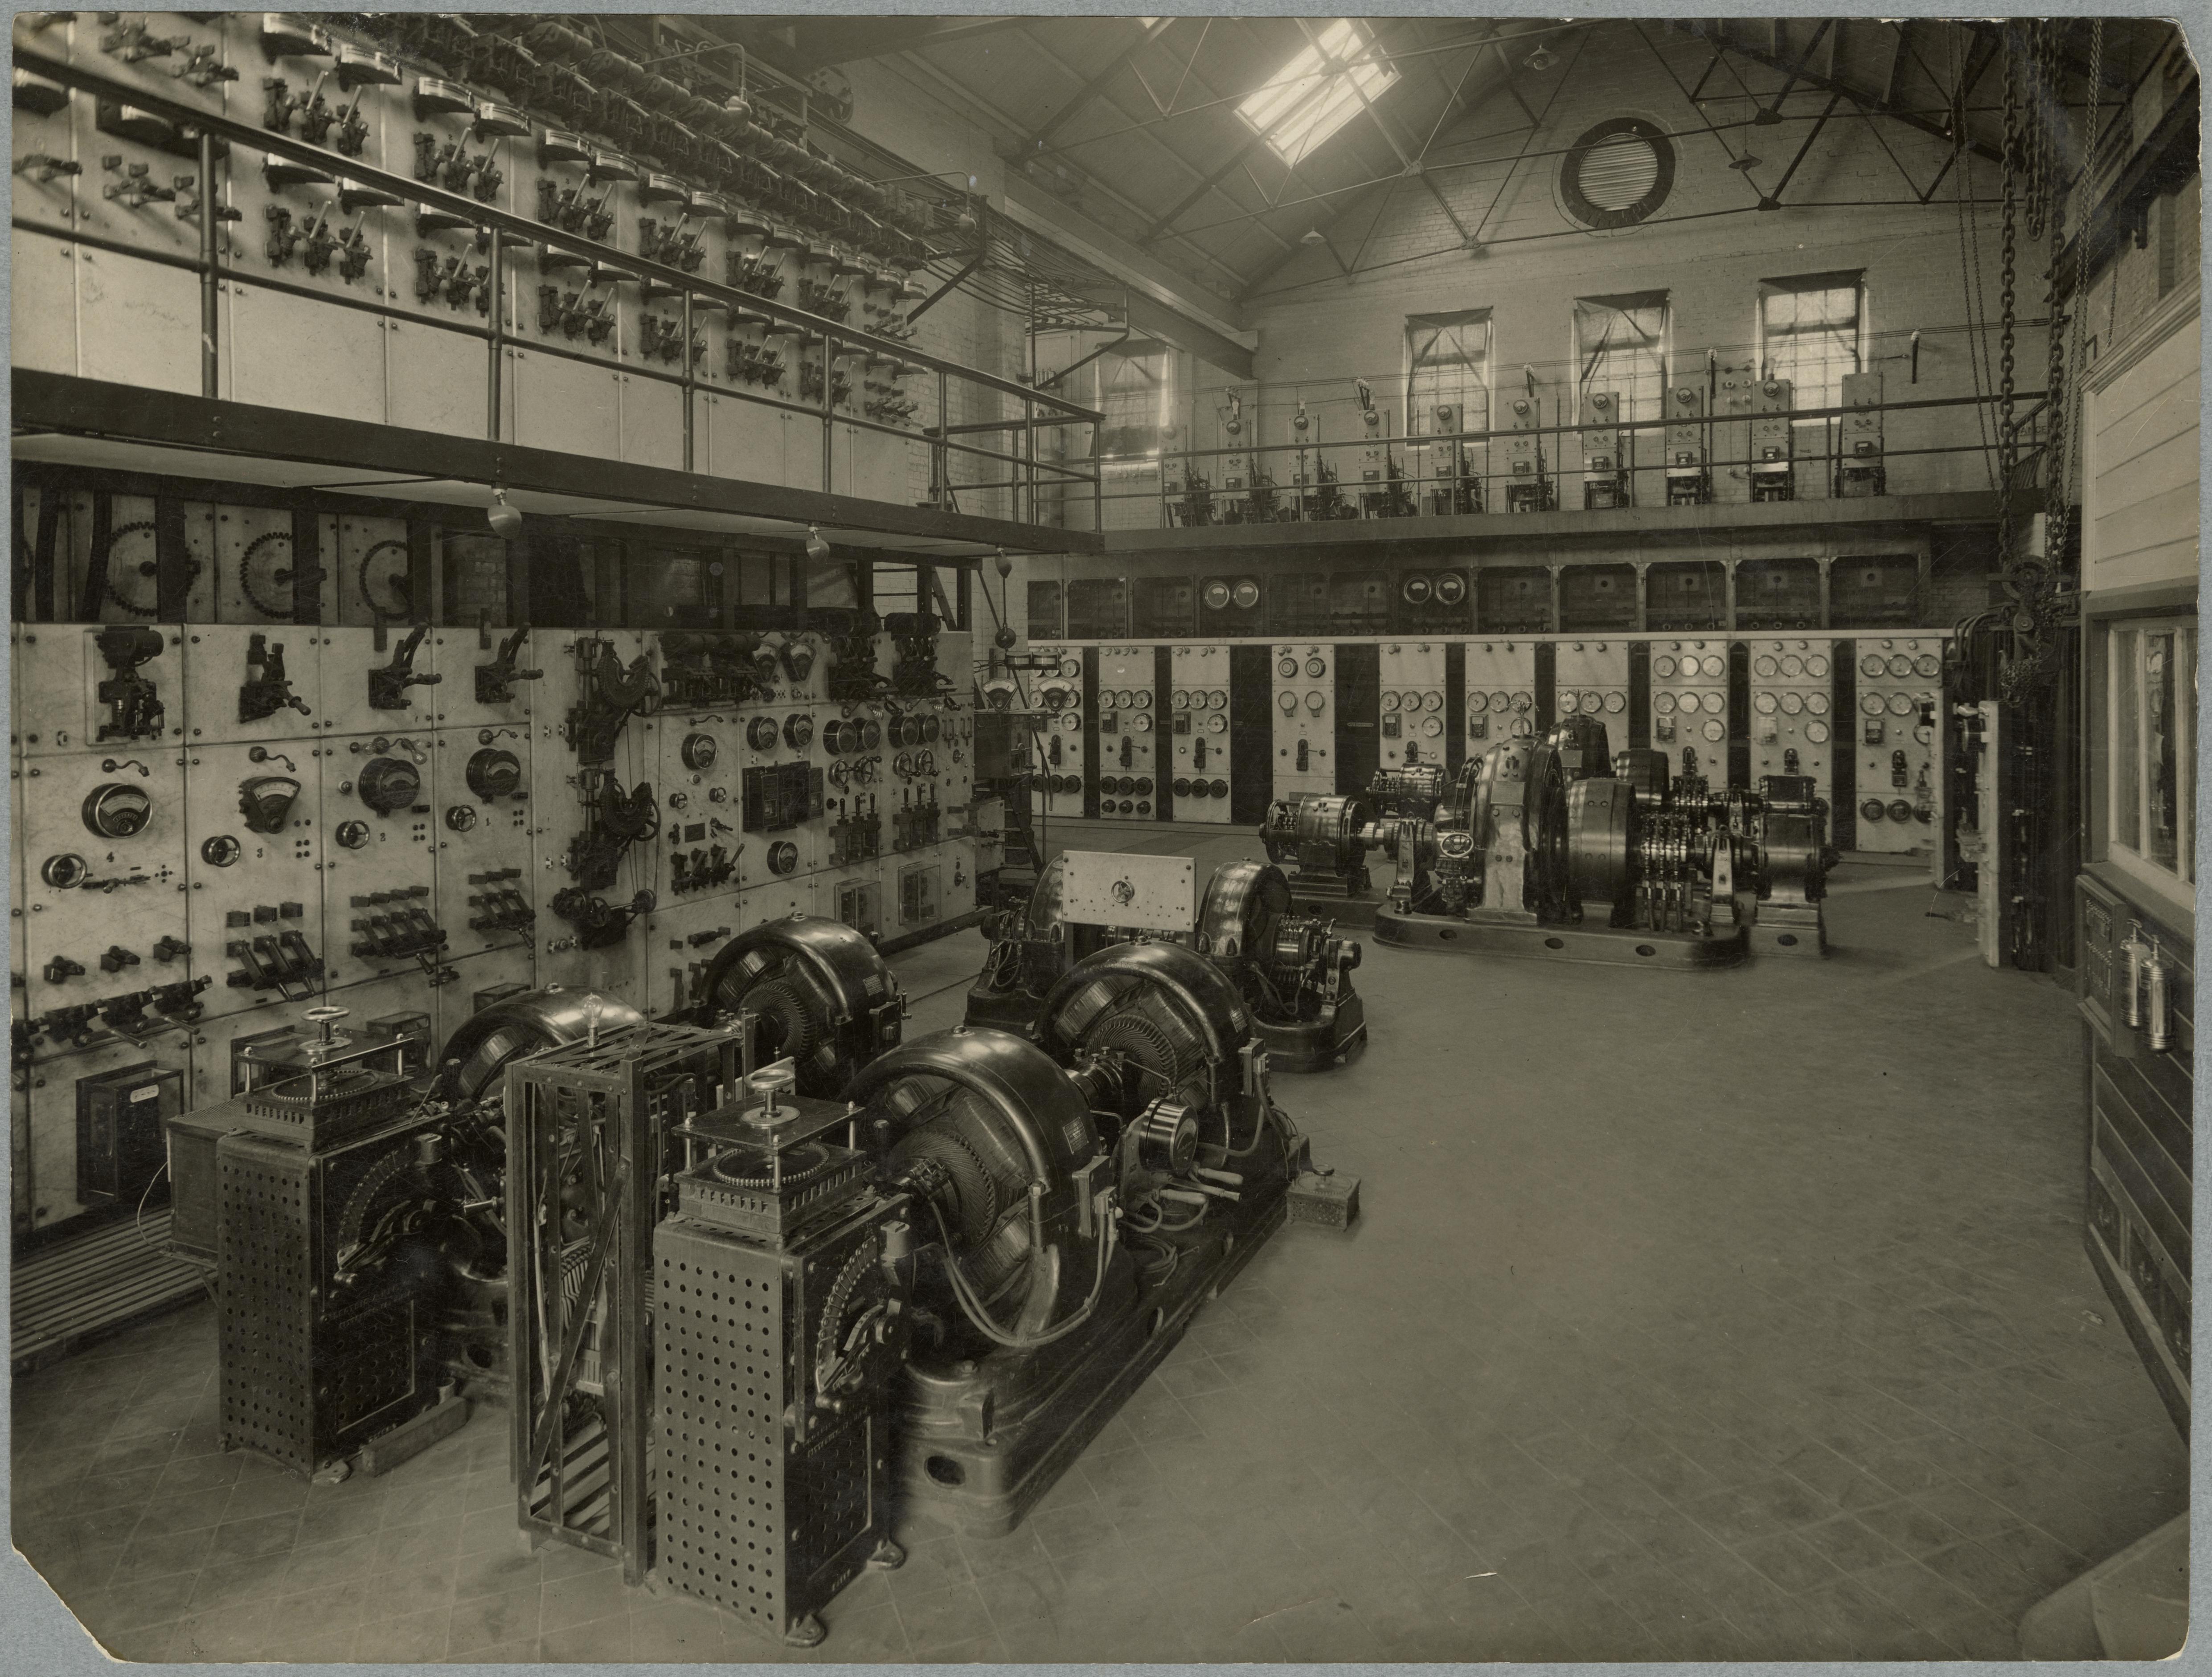 Image of Main converter station interior